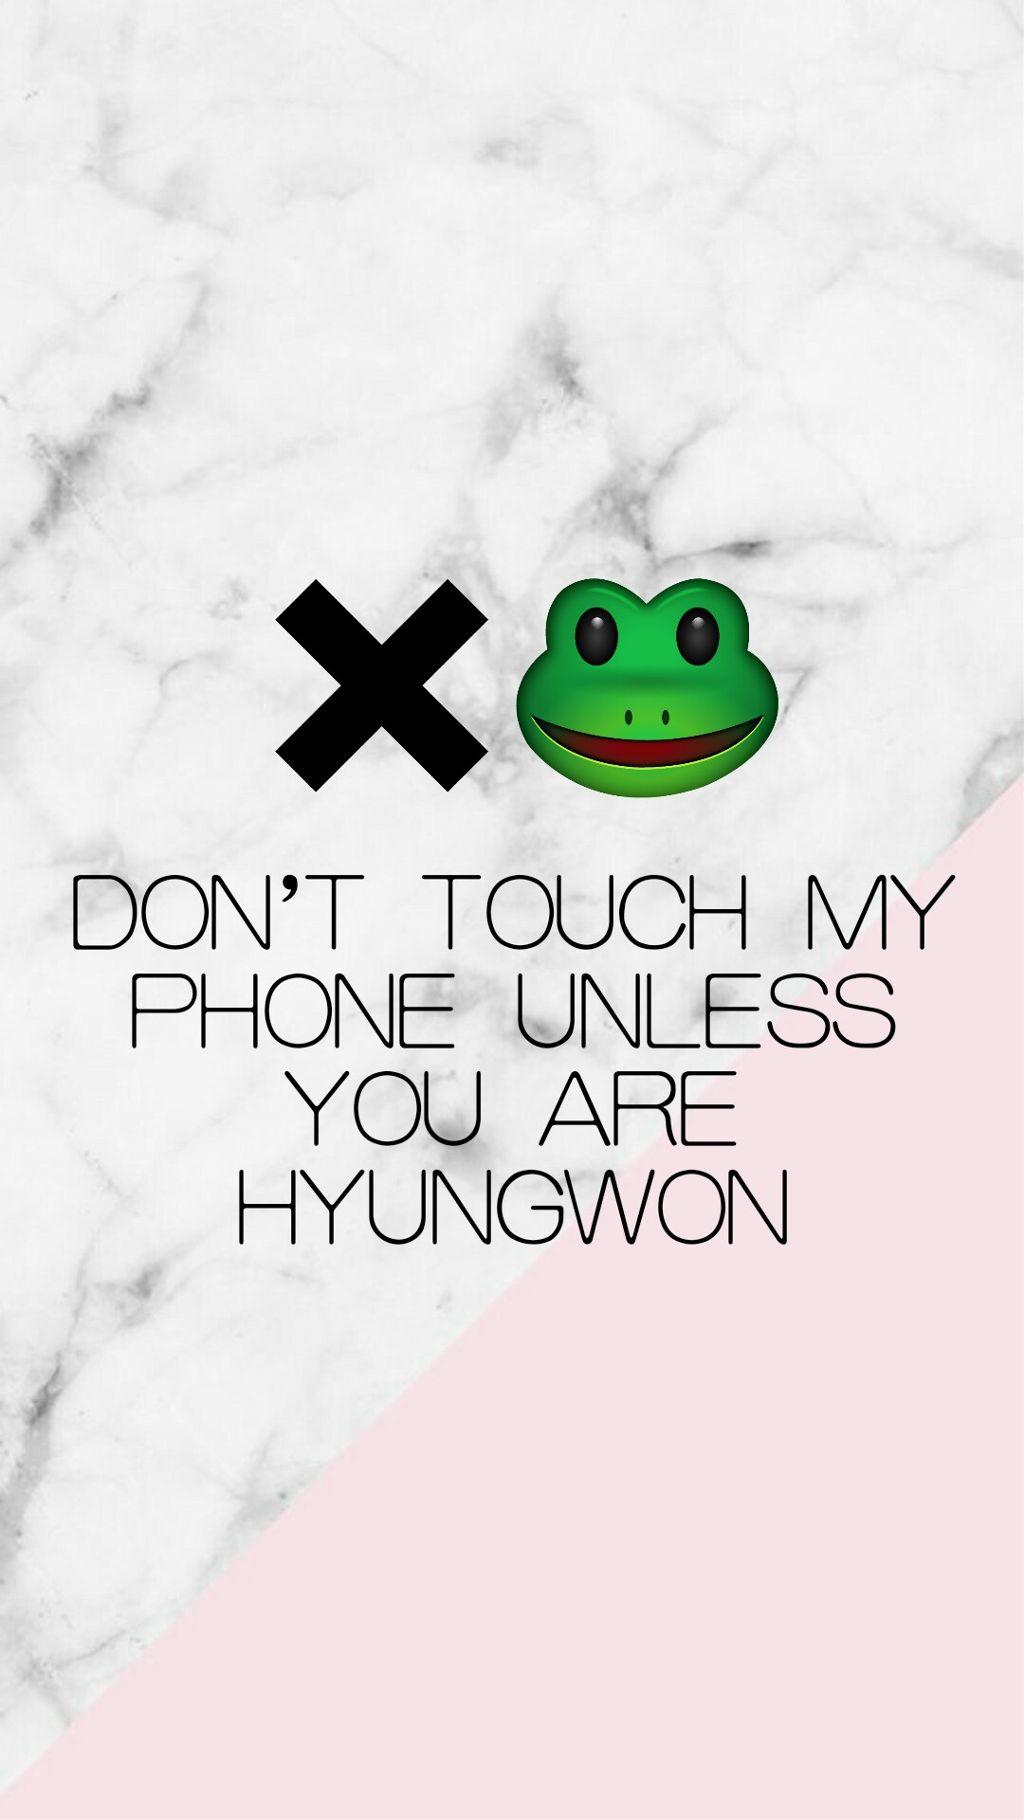 Hyungwon Monstax Kpop Emoji Wallpaper Lockscreen